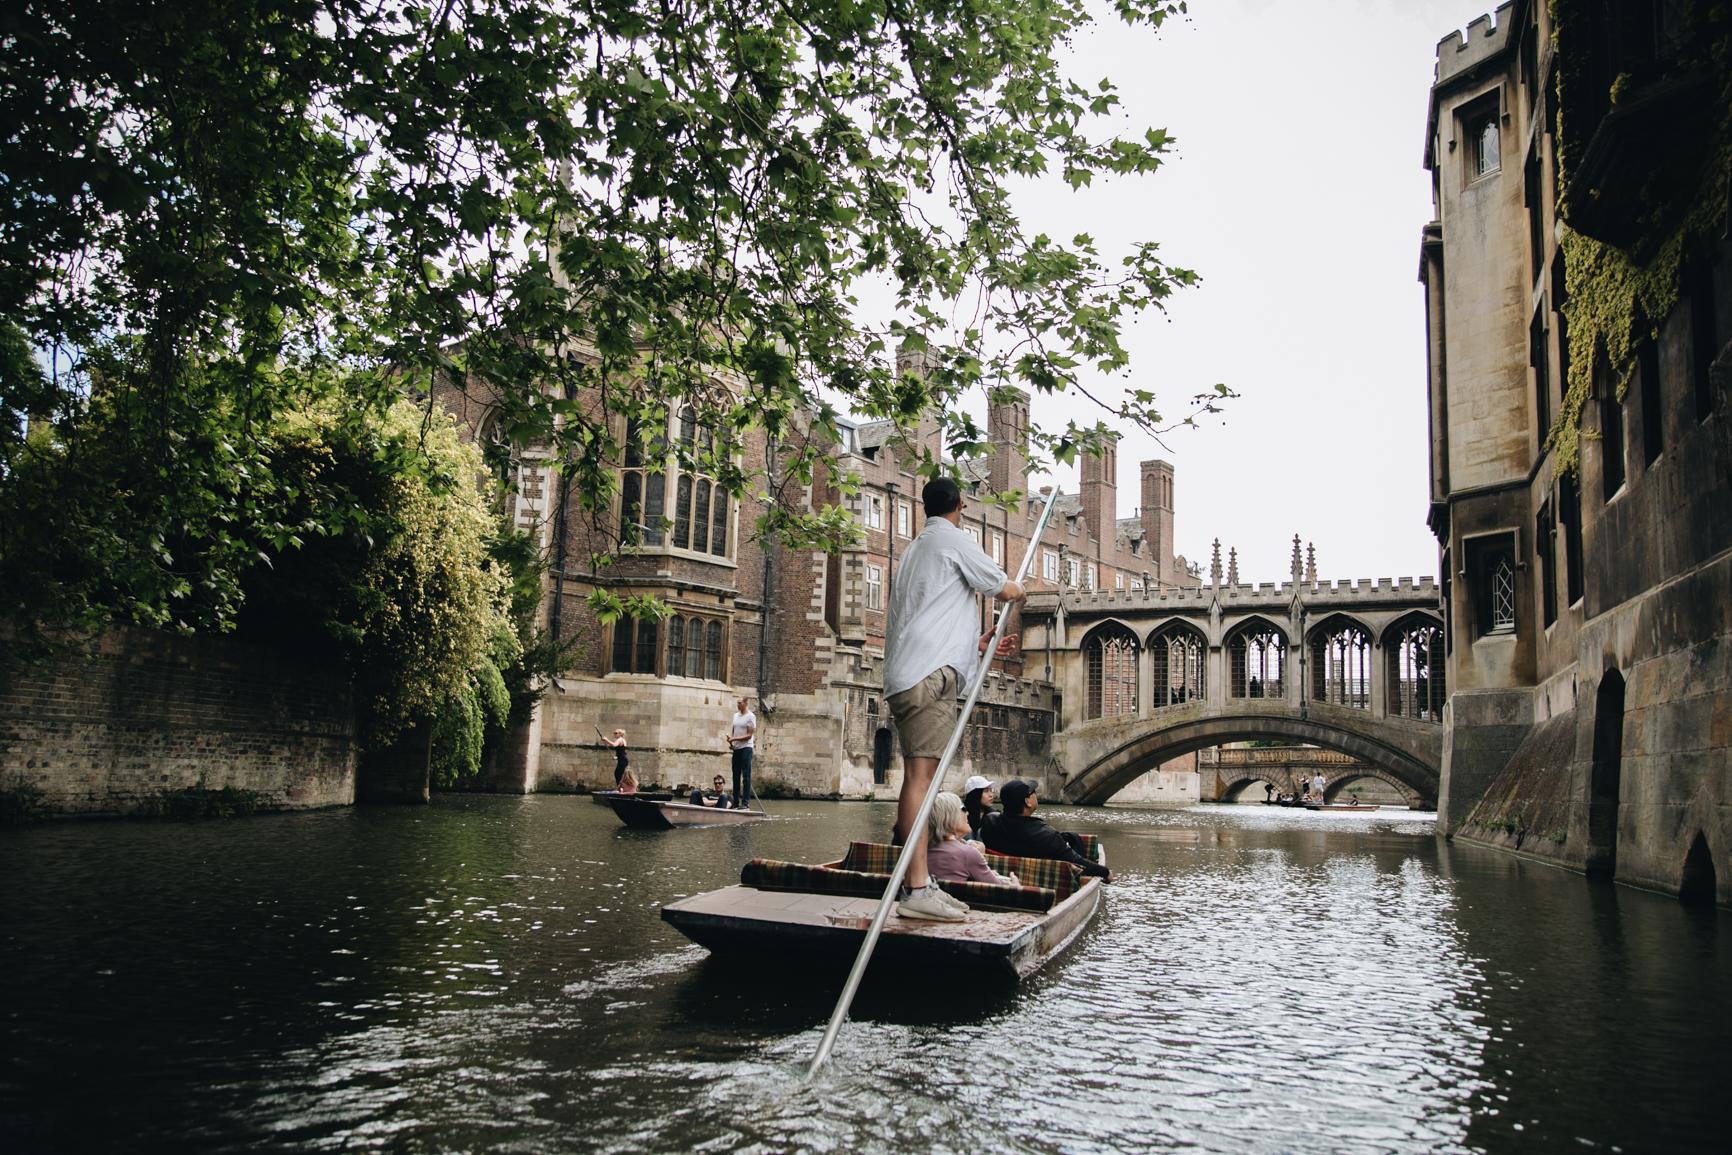 Punting-in-Cambridge-pont-des-soupirs-universite.jpg